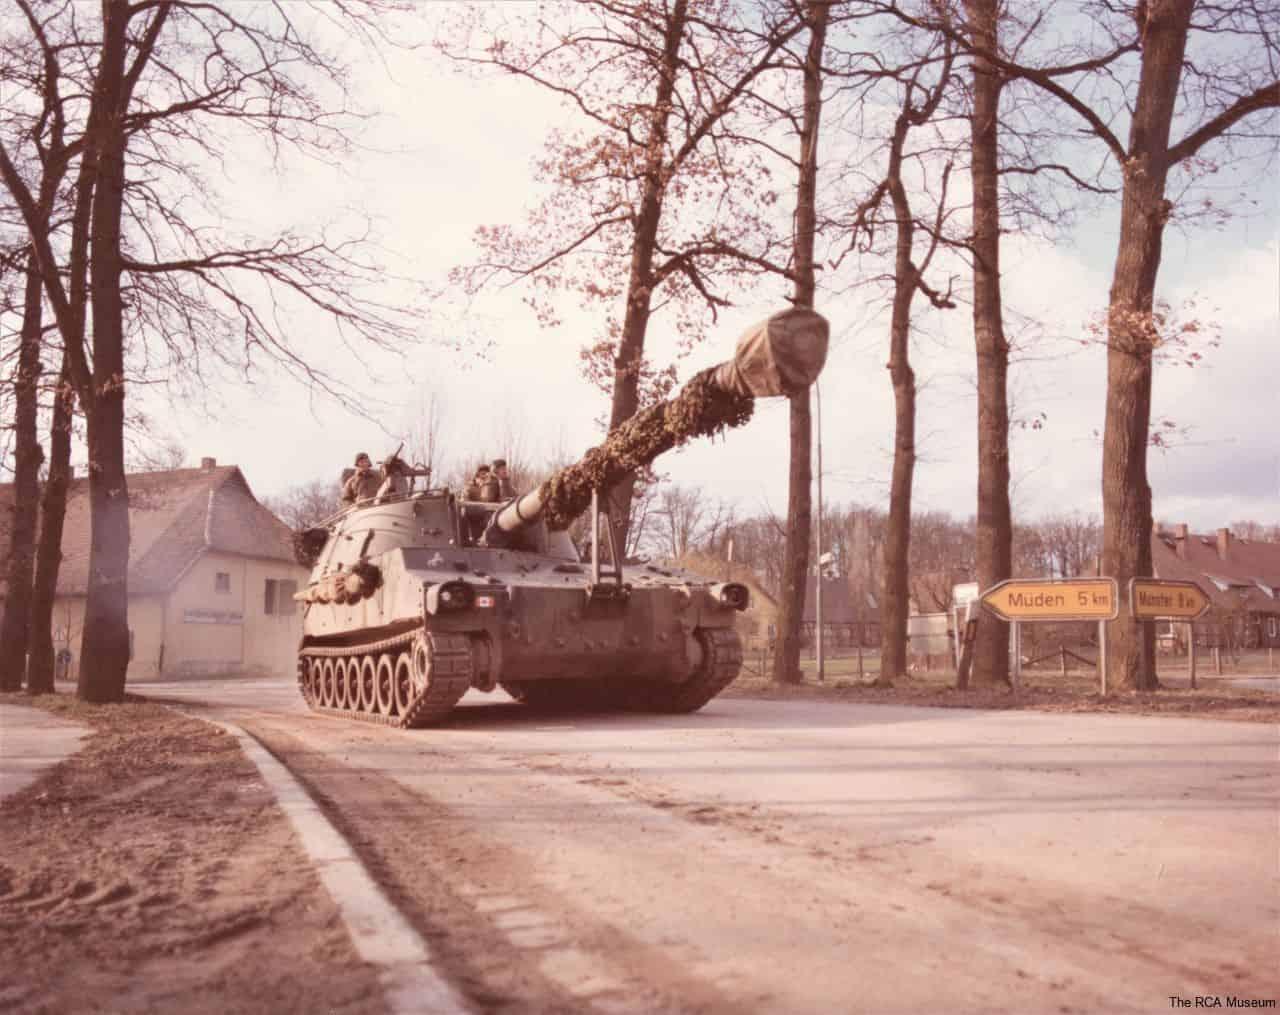 045-1978-Germany